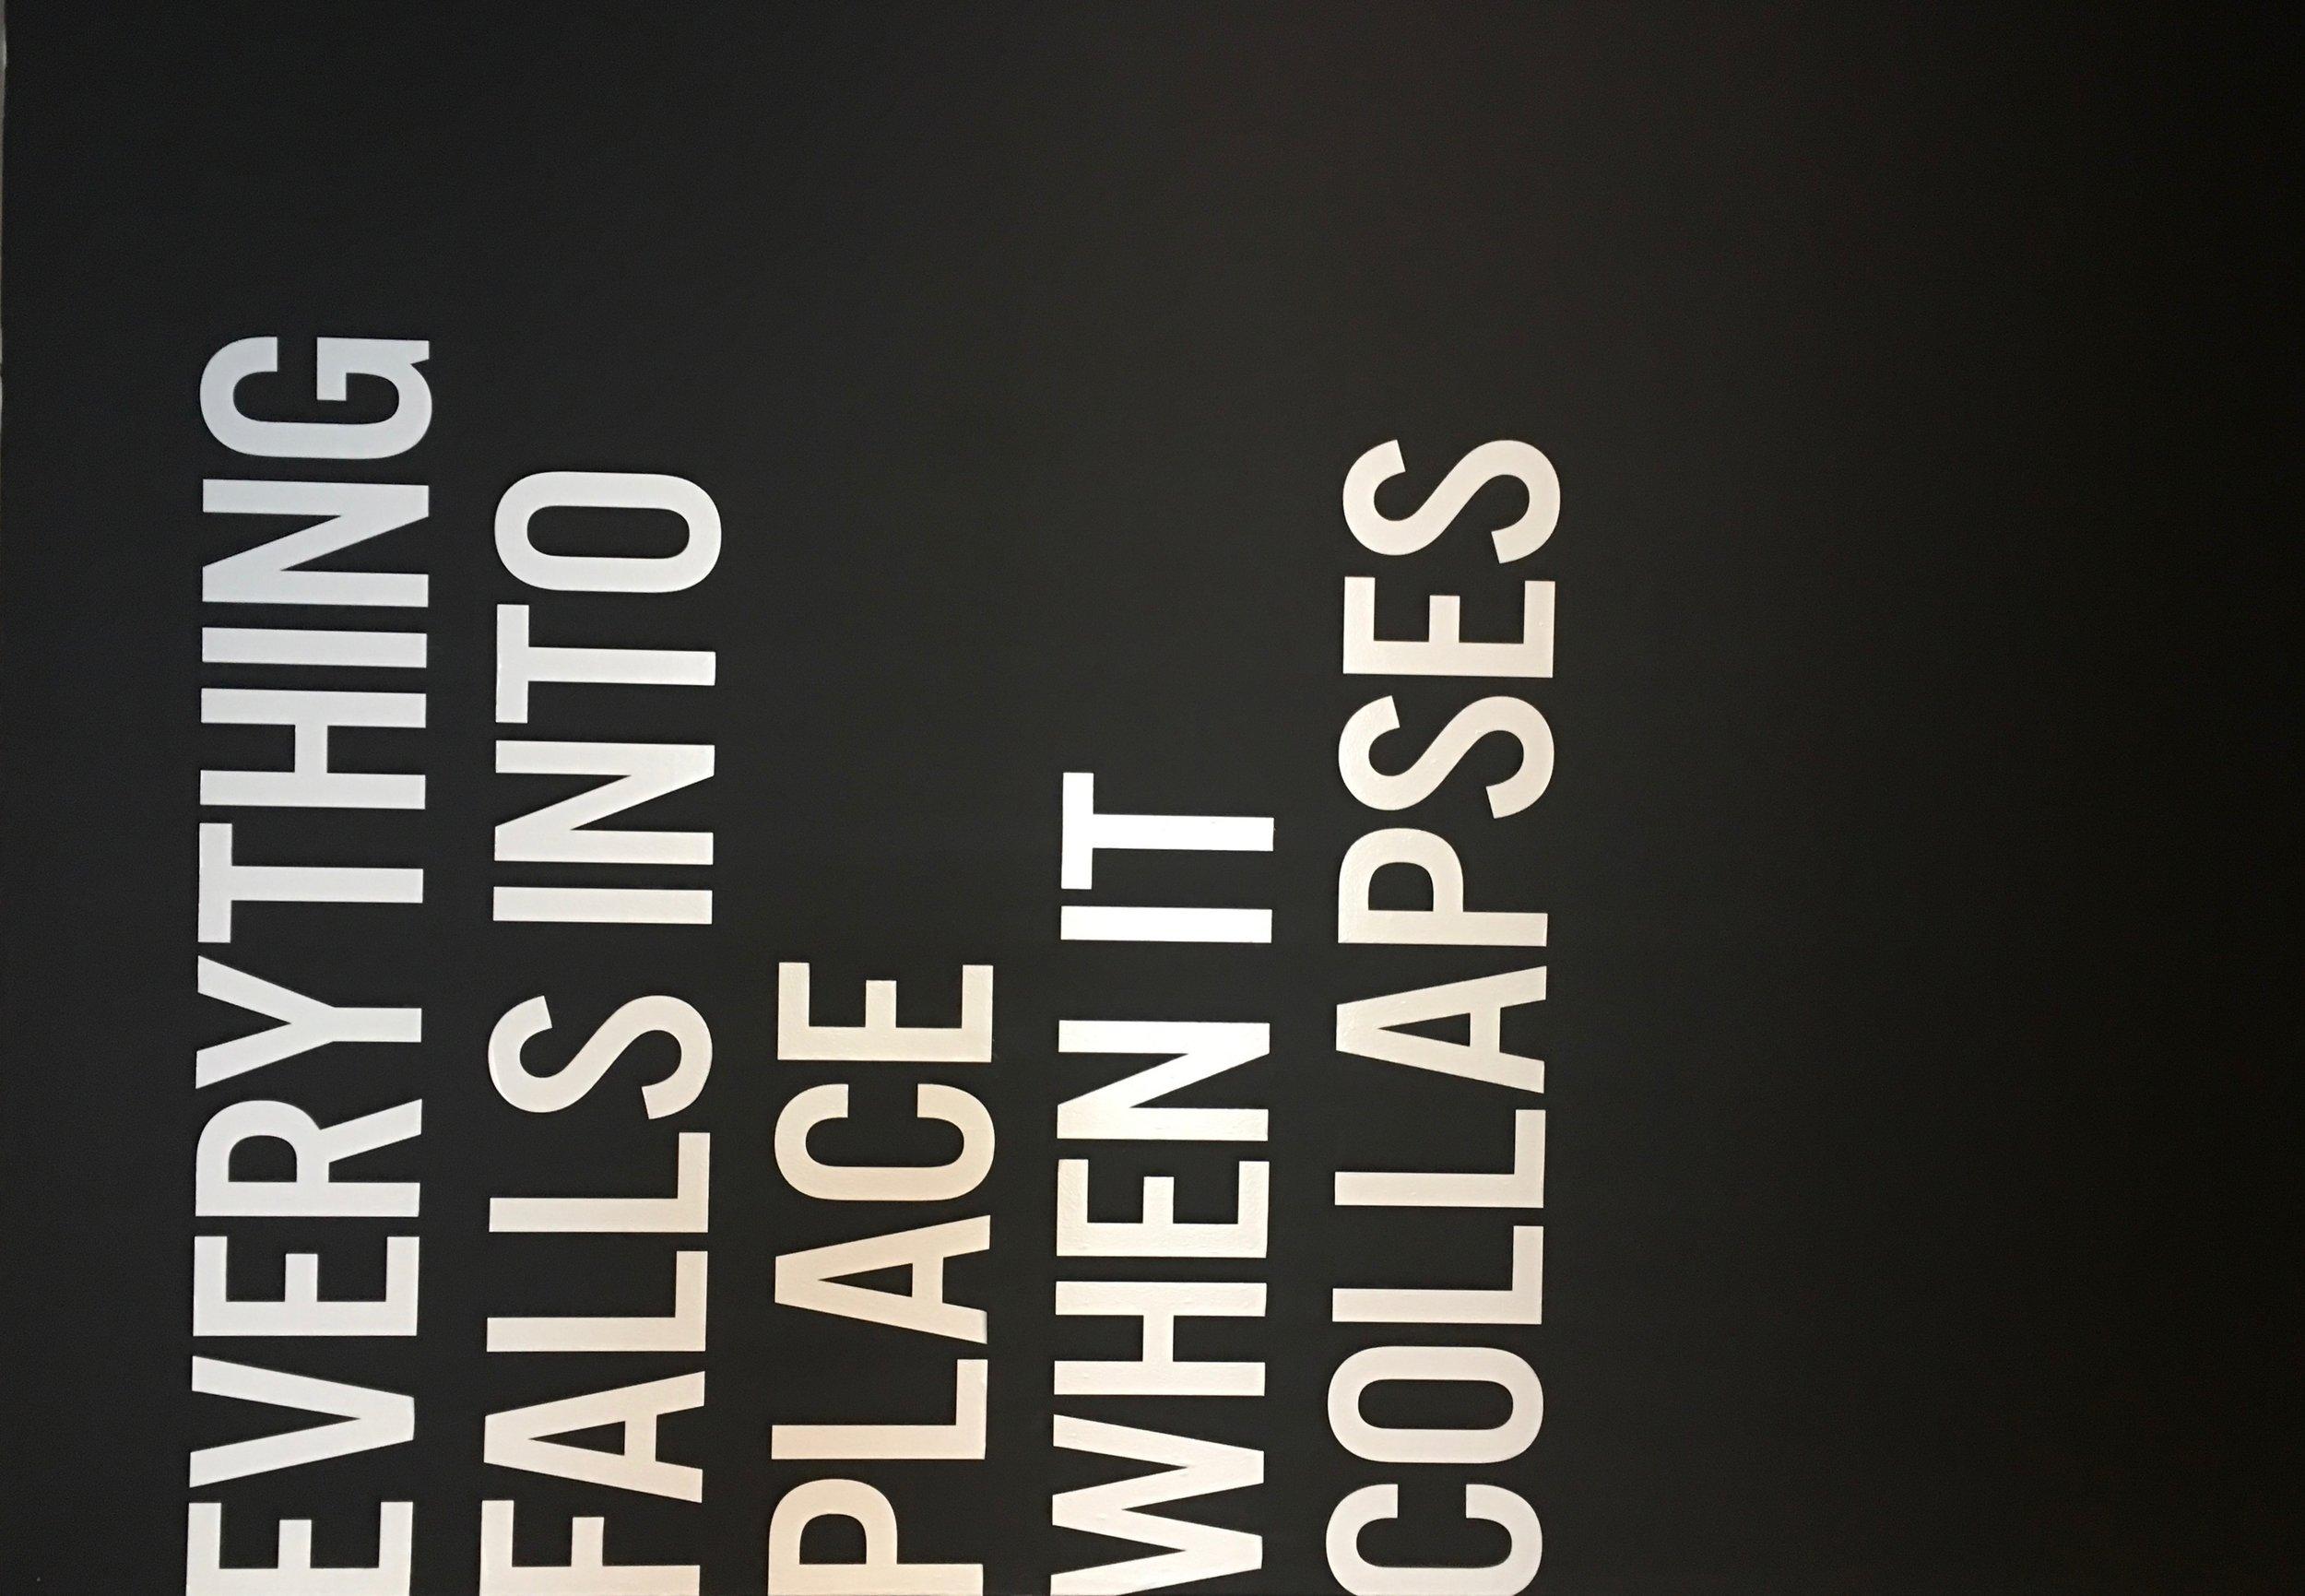 Scottsdale Museum of Contemporary Art: Santiago Borja exhibition graphics